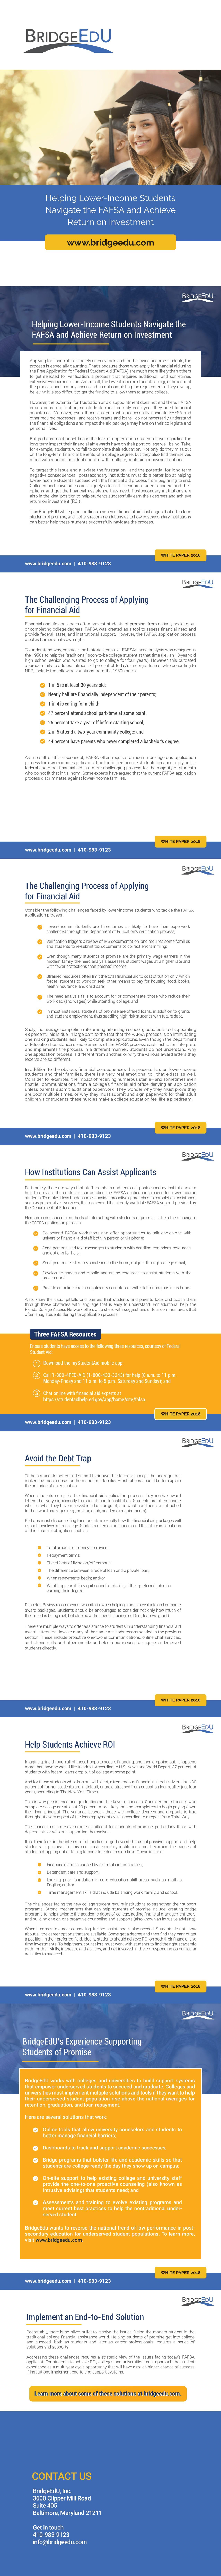 BridgeEdU Financial Aid White Paper